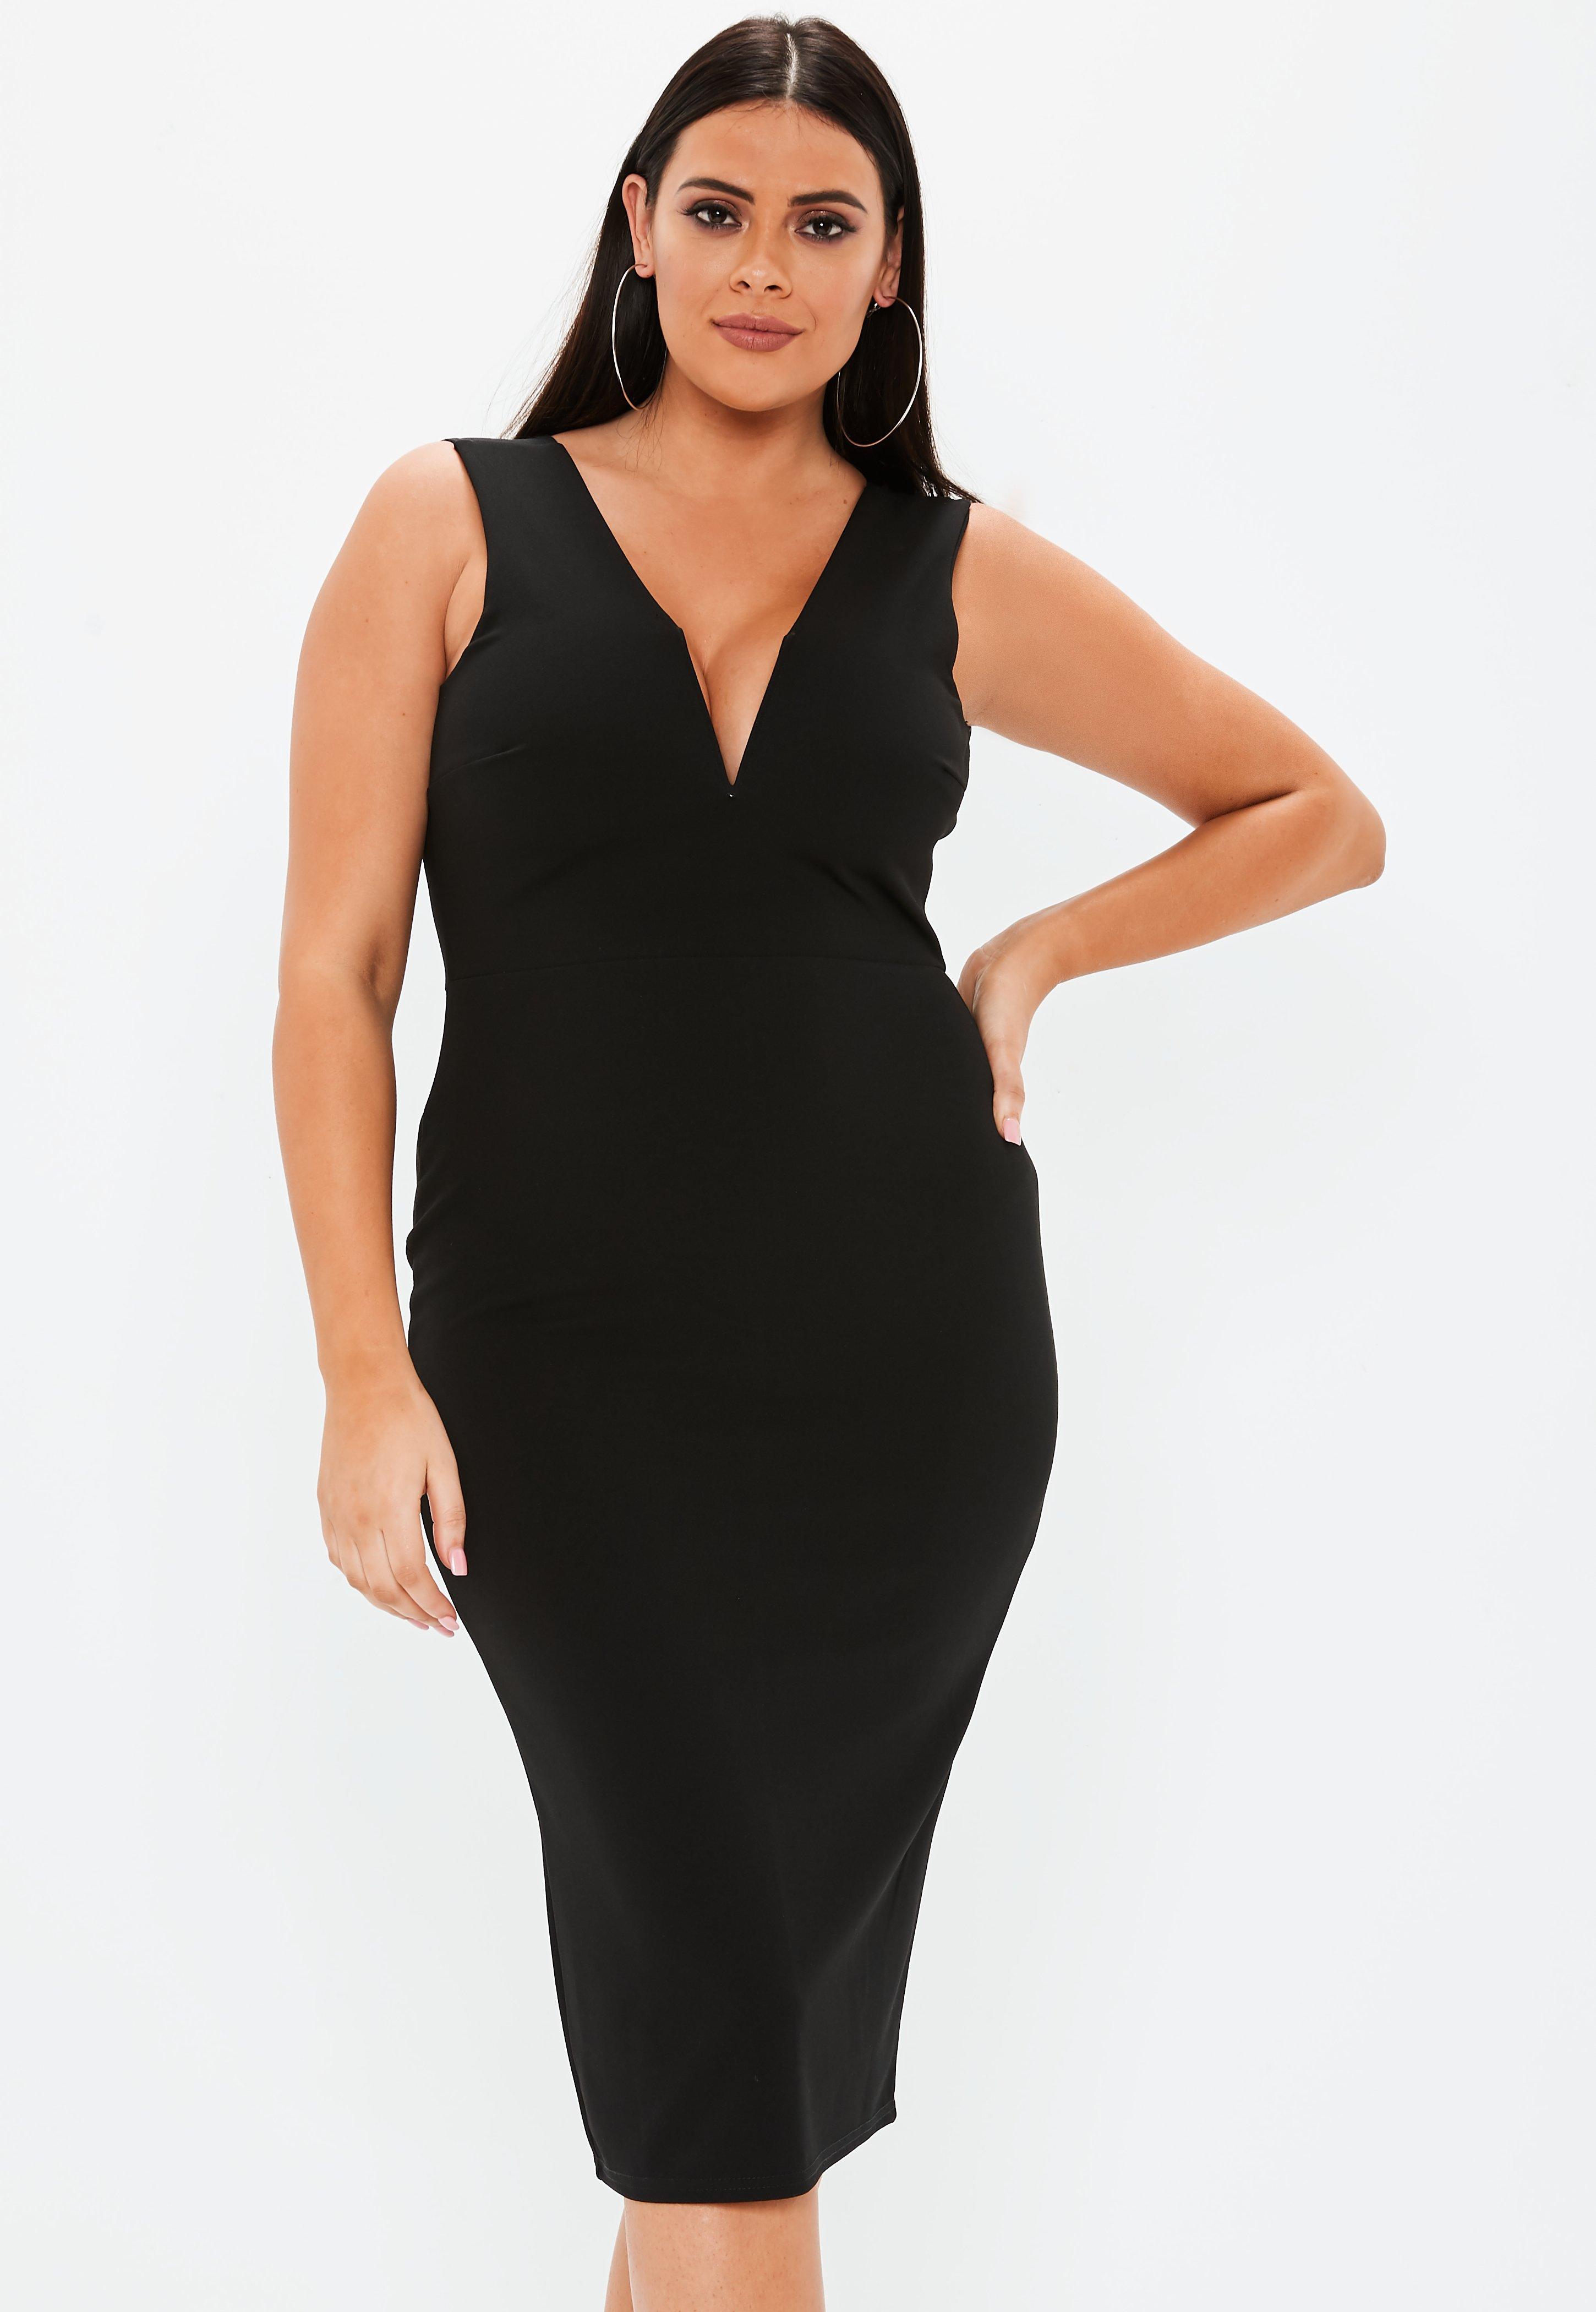 Plus Size Clothing   Plus Size Womens Fashion - Missguided+ ff058b374e39